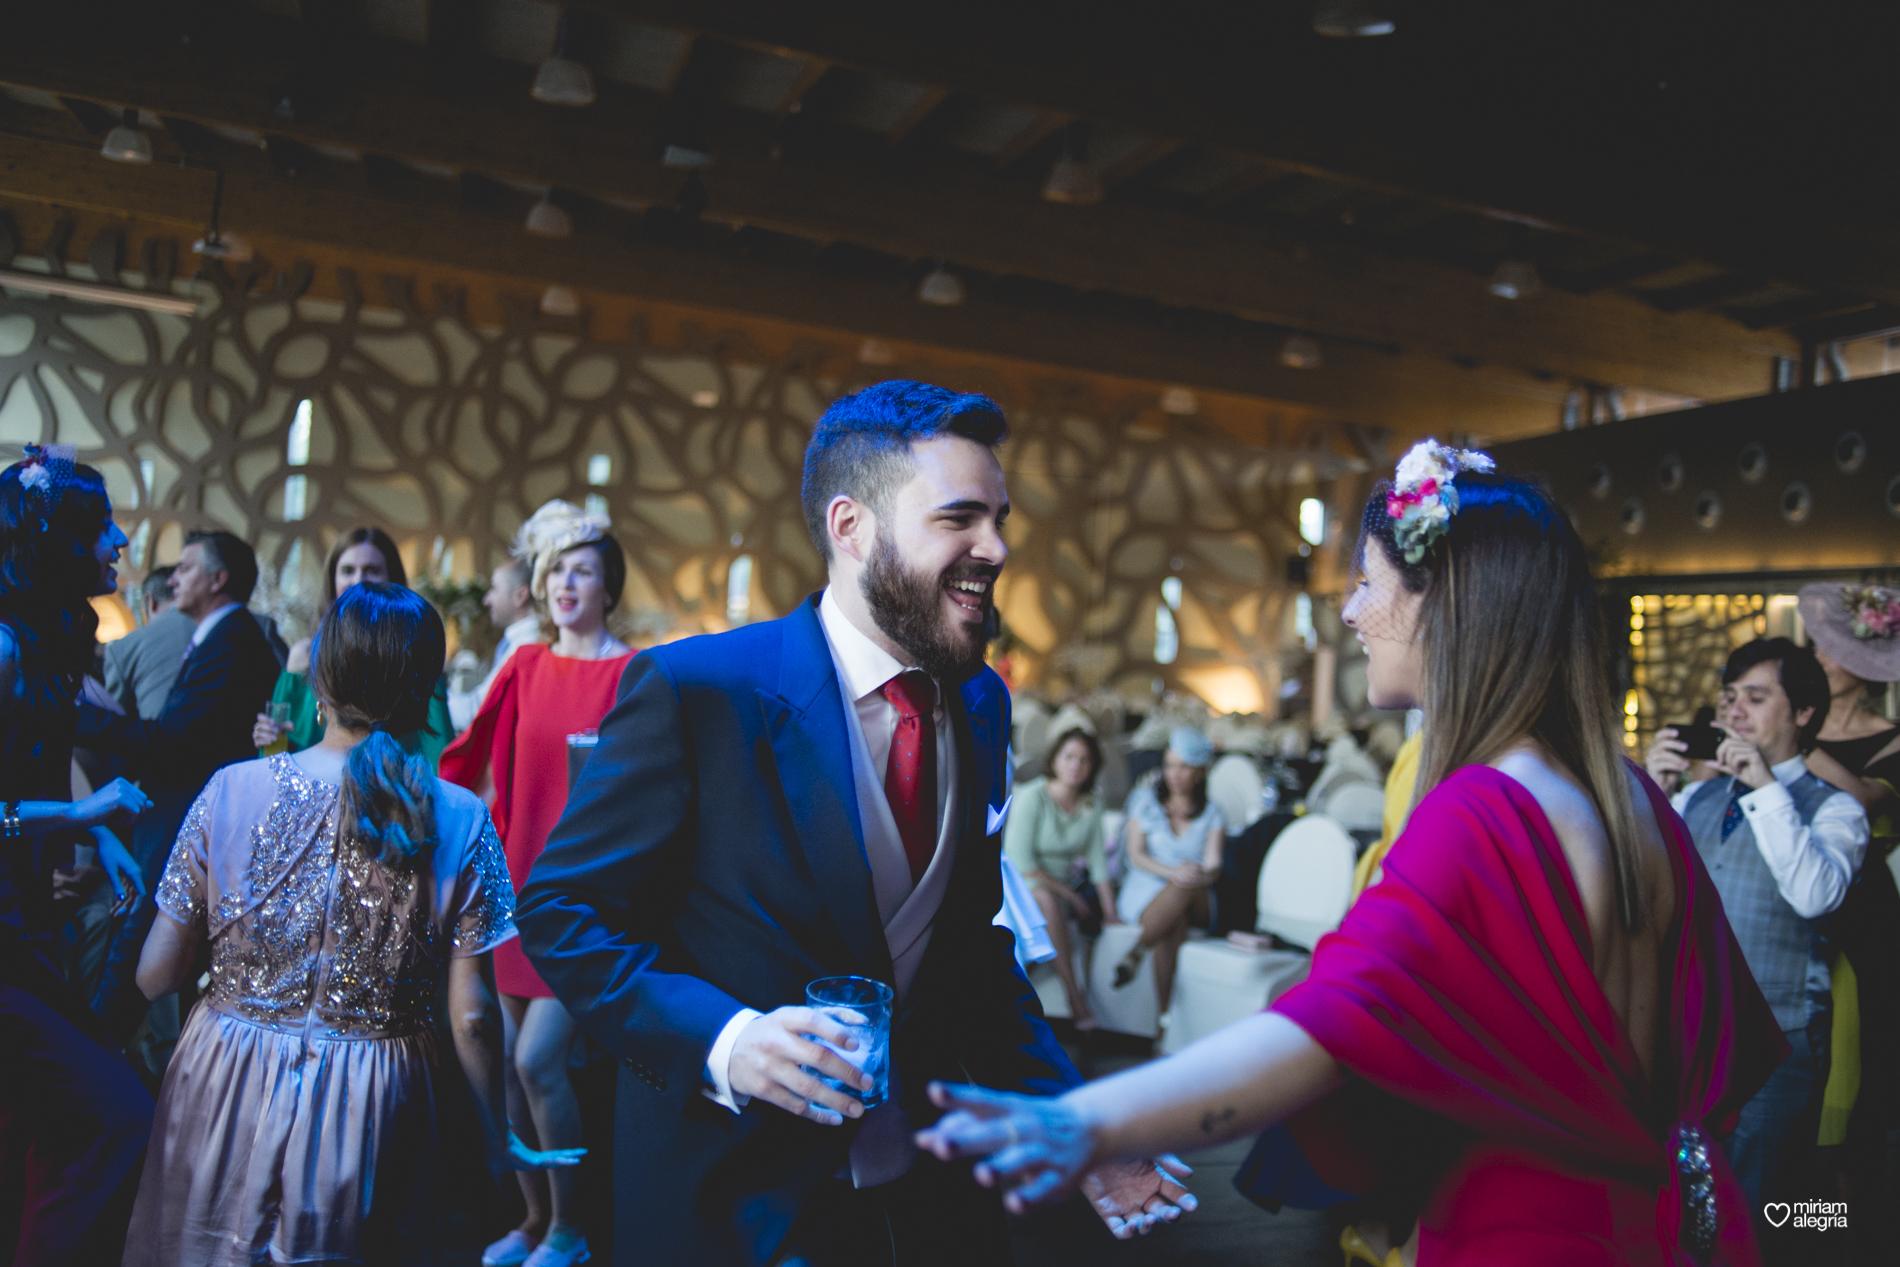 boda-en-la-catedral-de-murcia-miriam-alegria-fotografos-boda-murcia-80